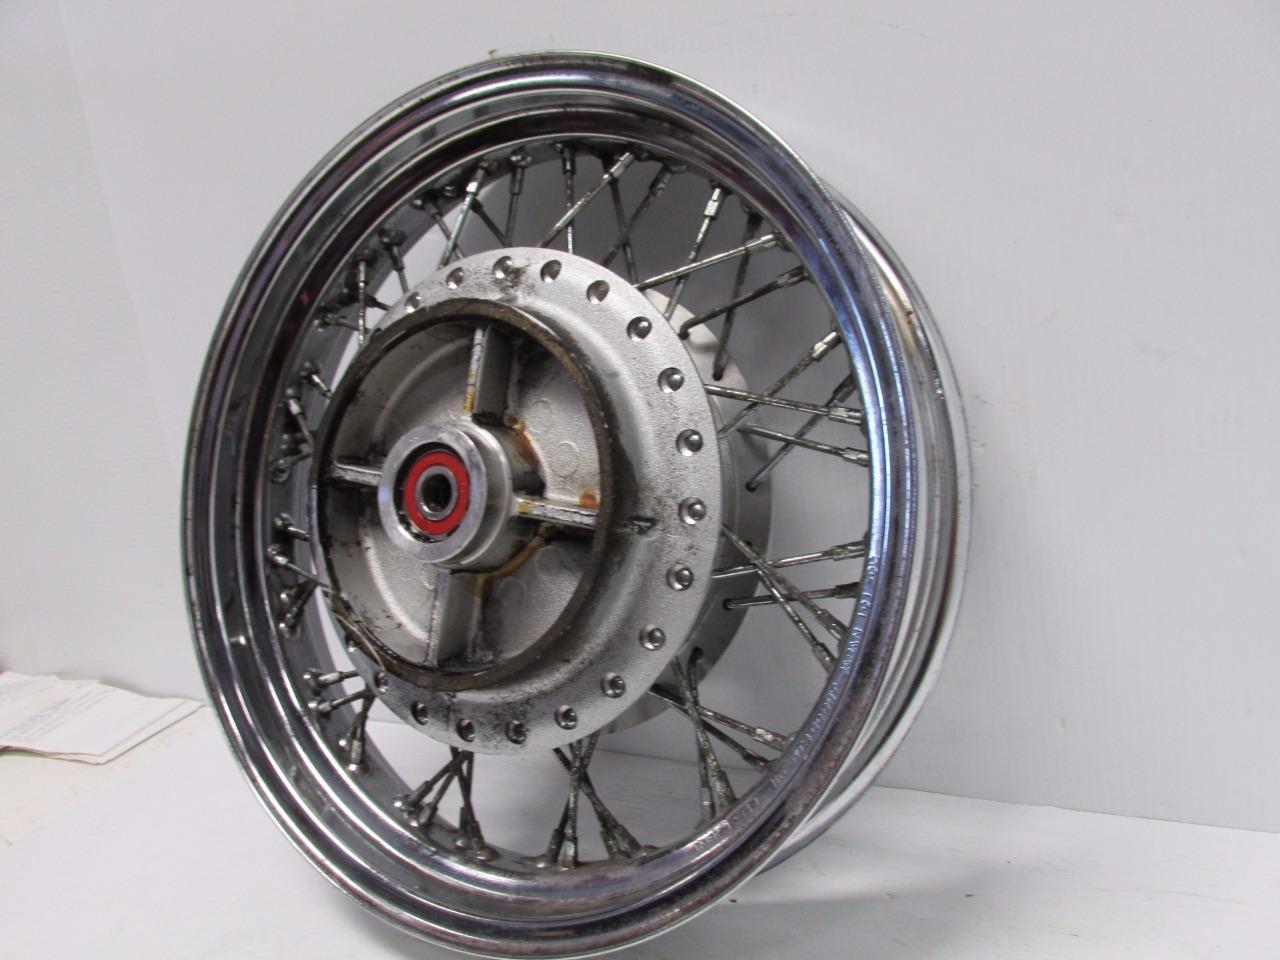 2002 Vulcan 800 Rear Wheel